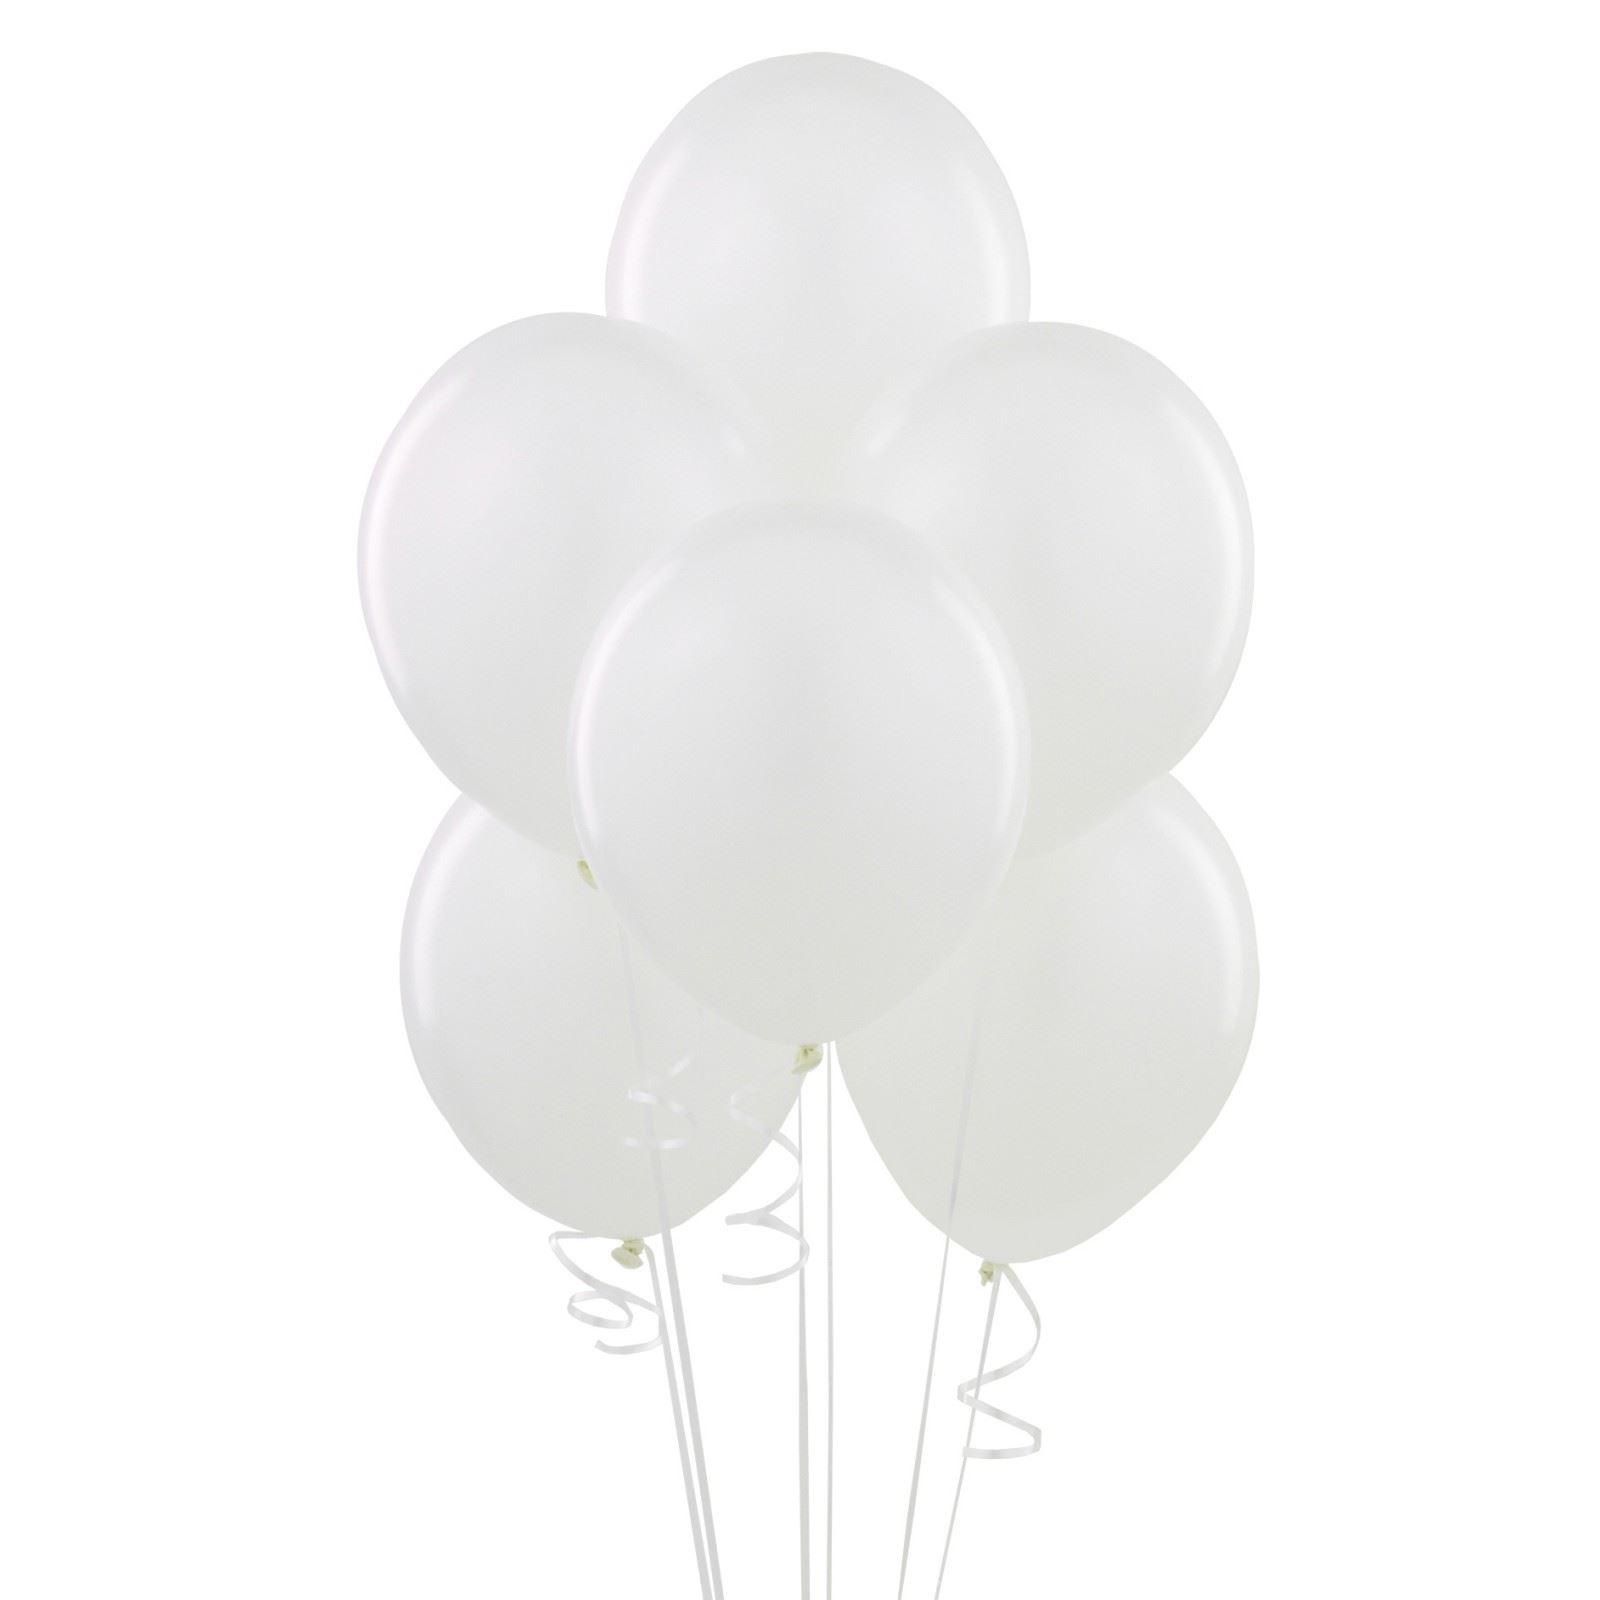 25pcs-Latex-Plain-Balloons-Helium-Quality-Ballons-Wedding-Balons-Birthday-Party thumbnail 13